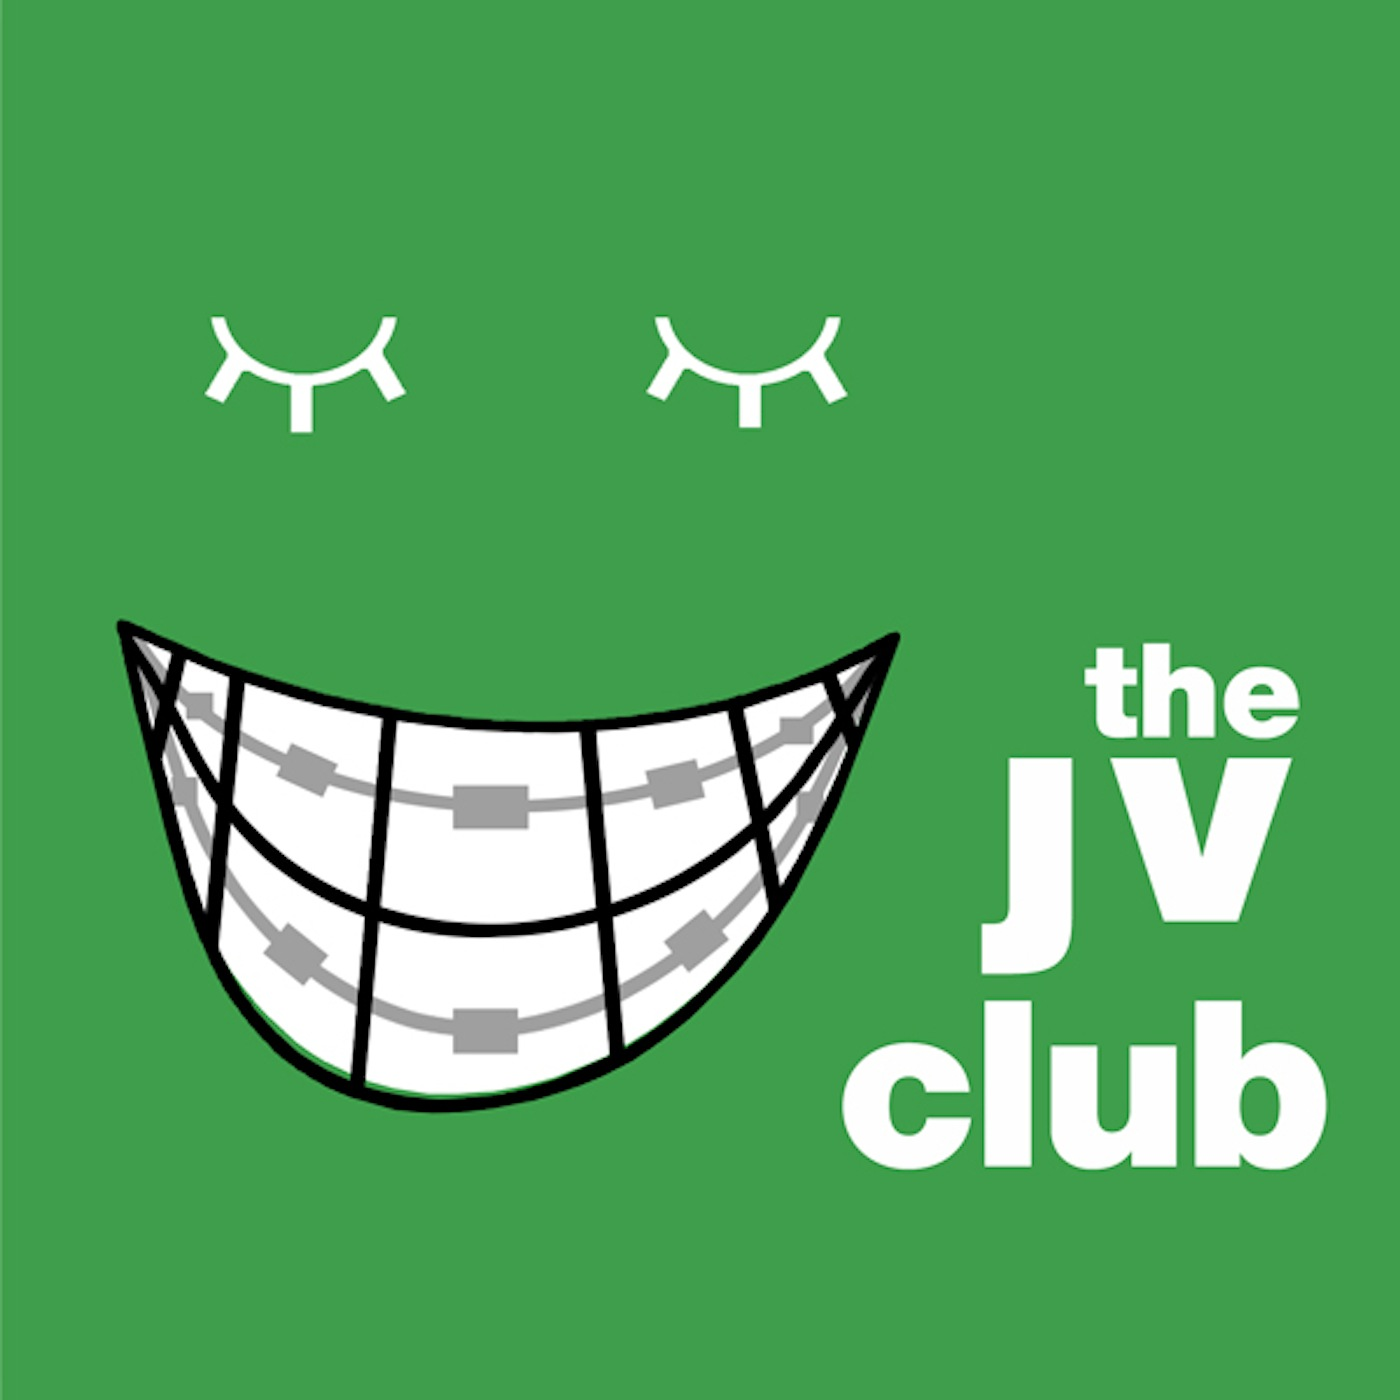 ___The JV Club with Janet Varney.jpg